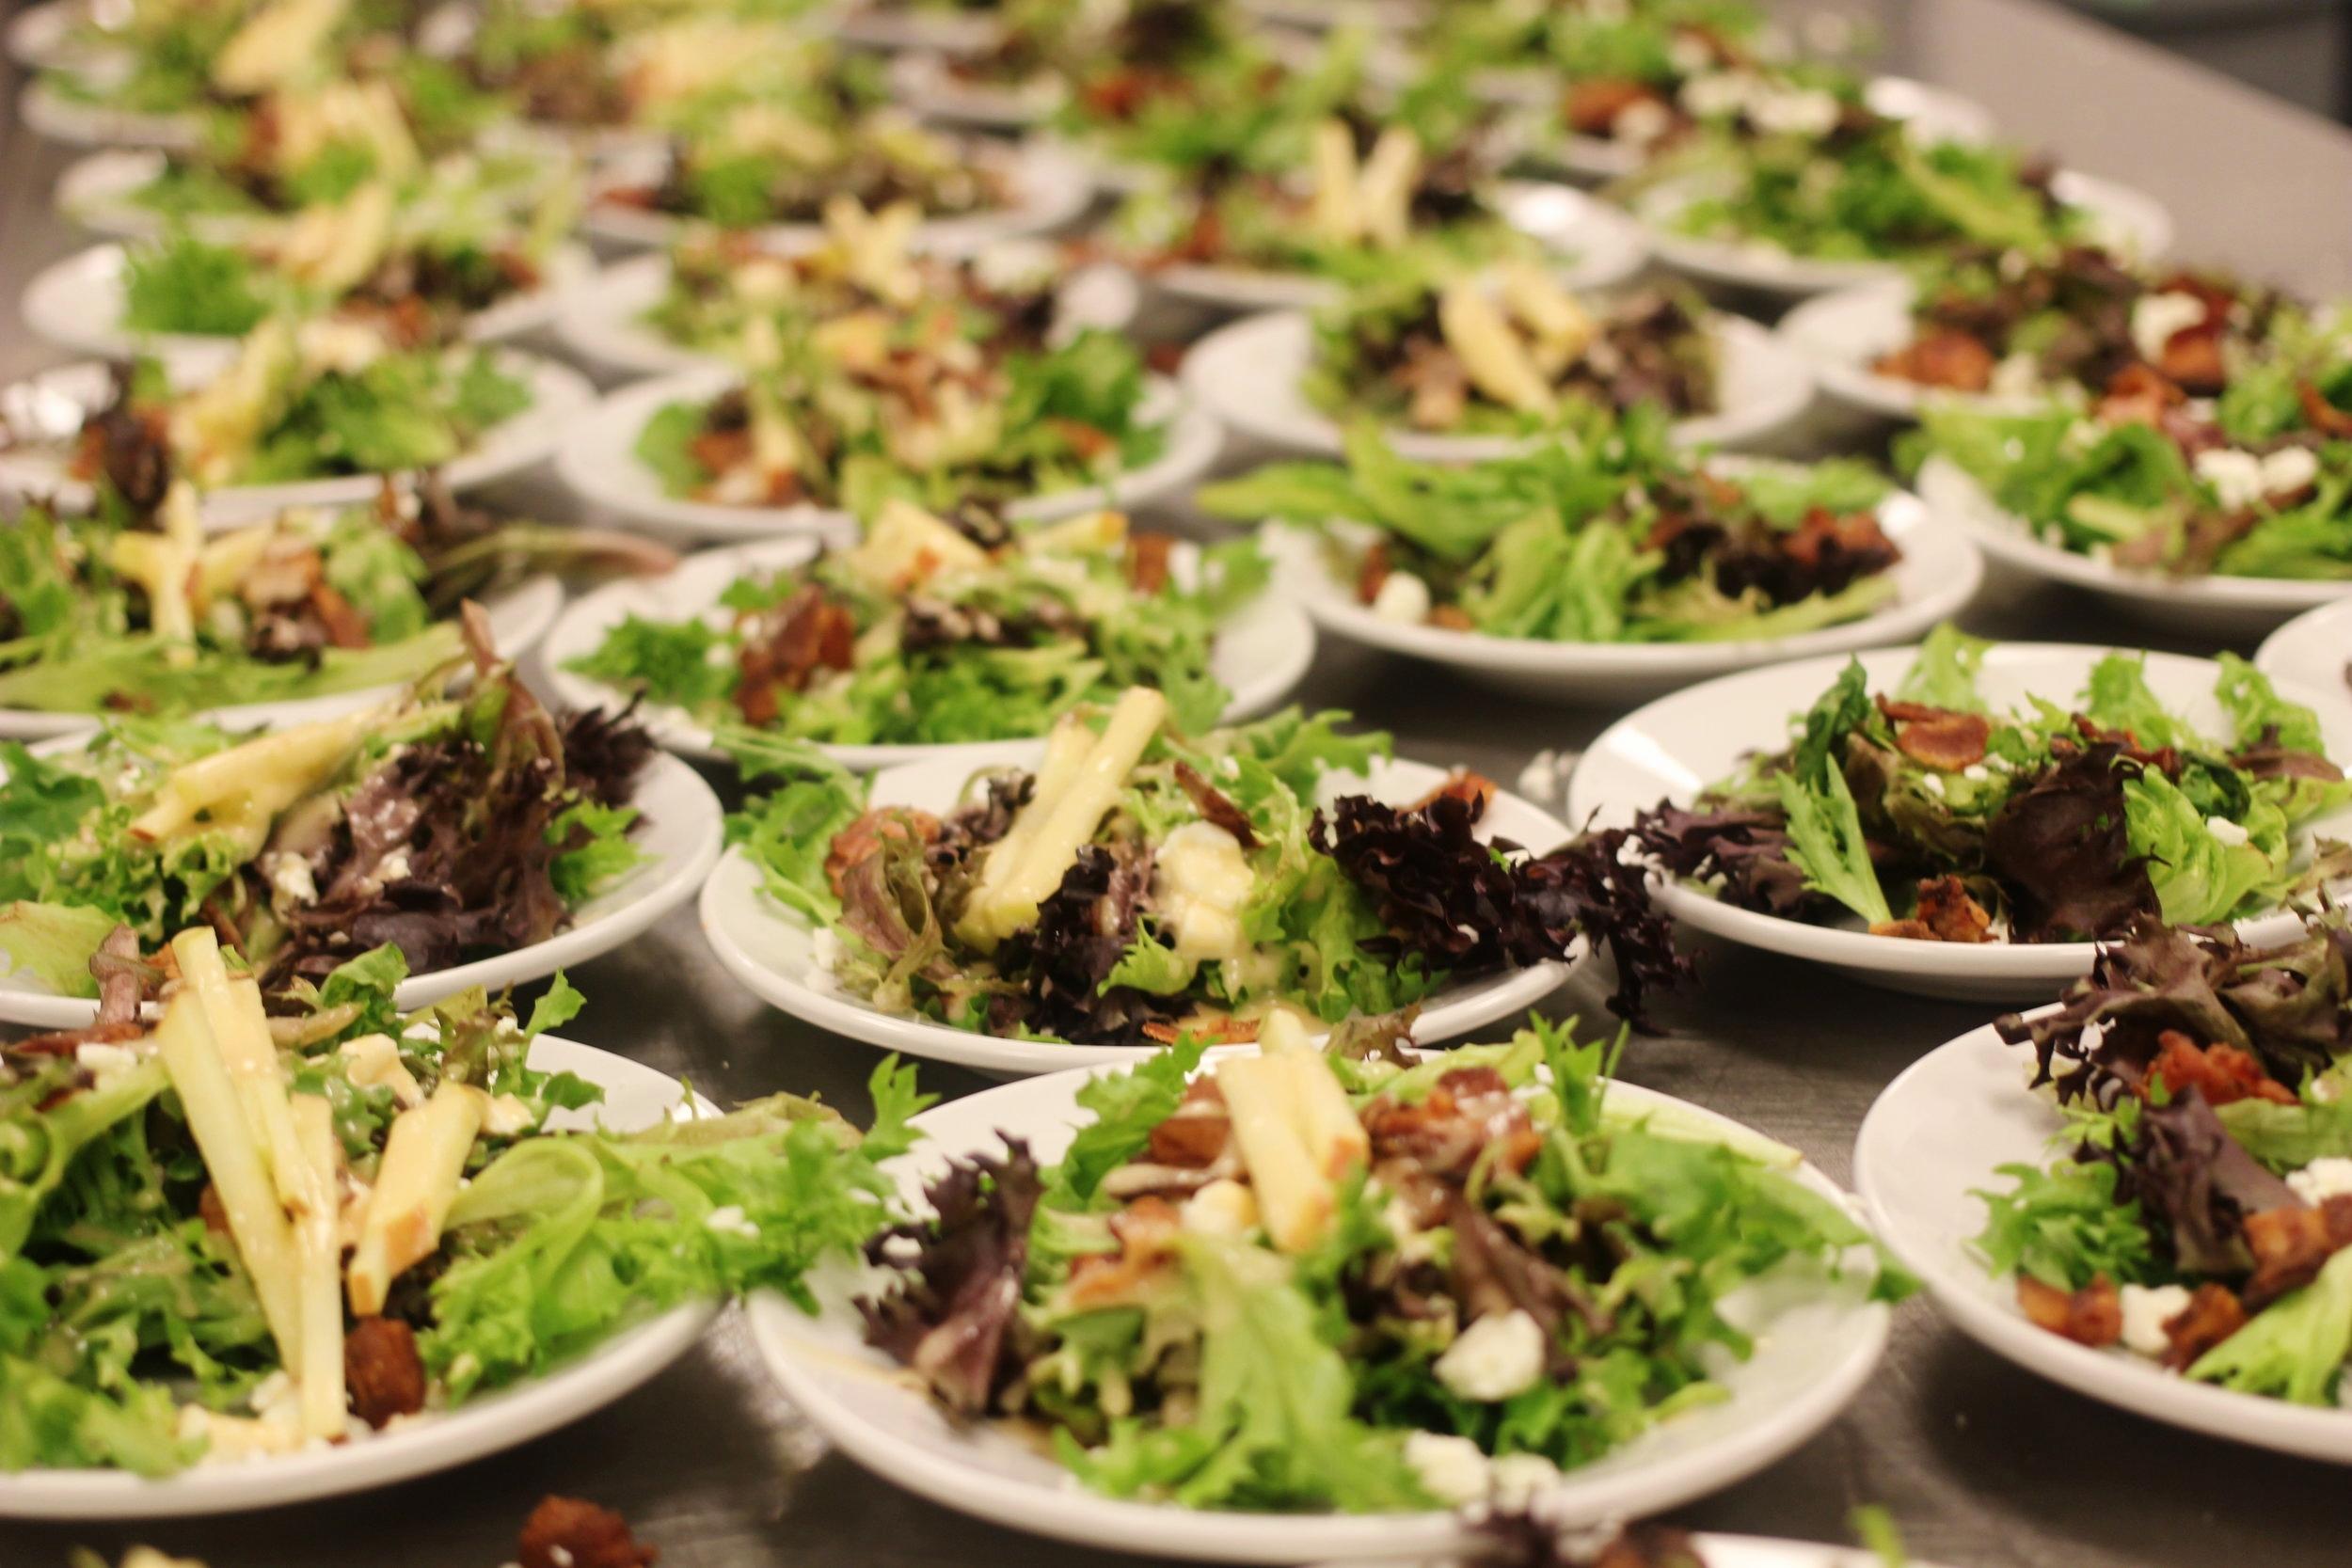 salads platted.JPG